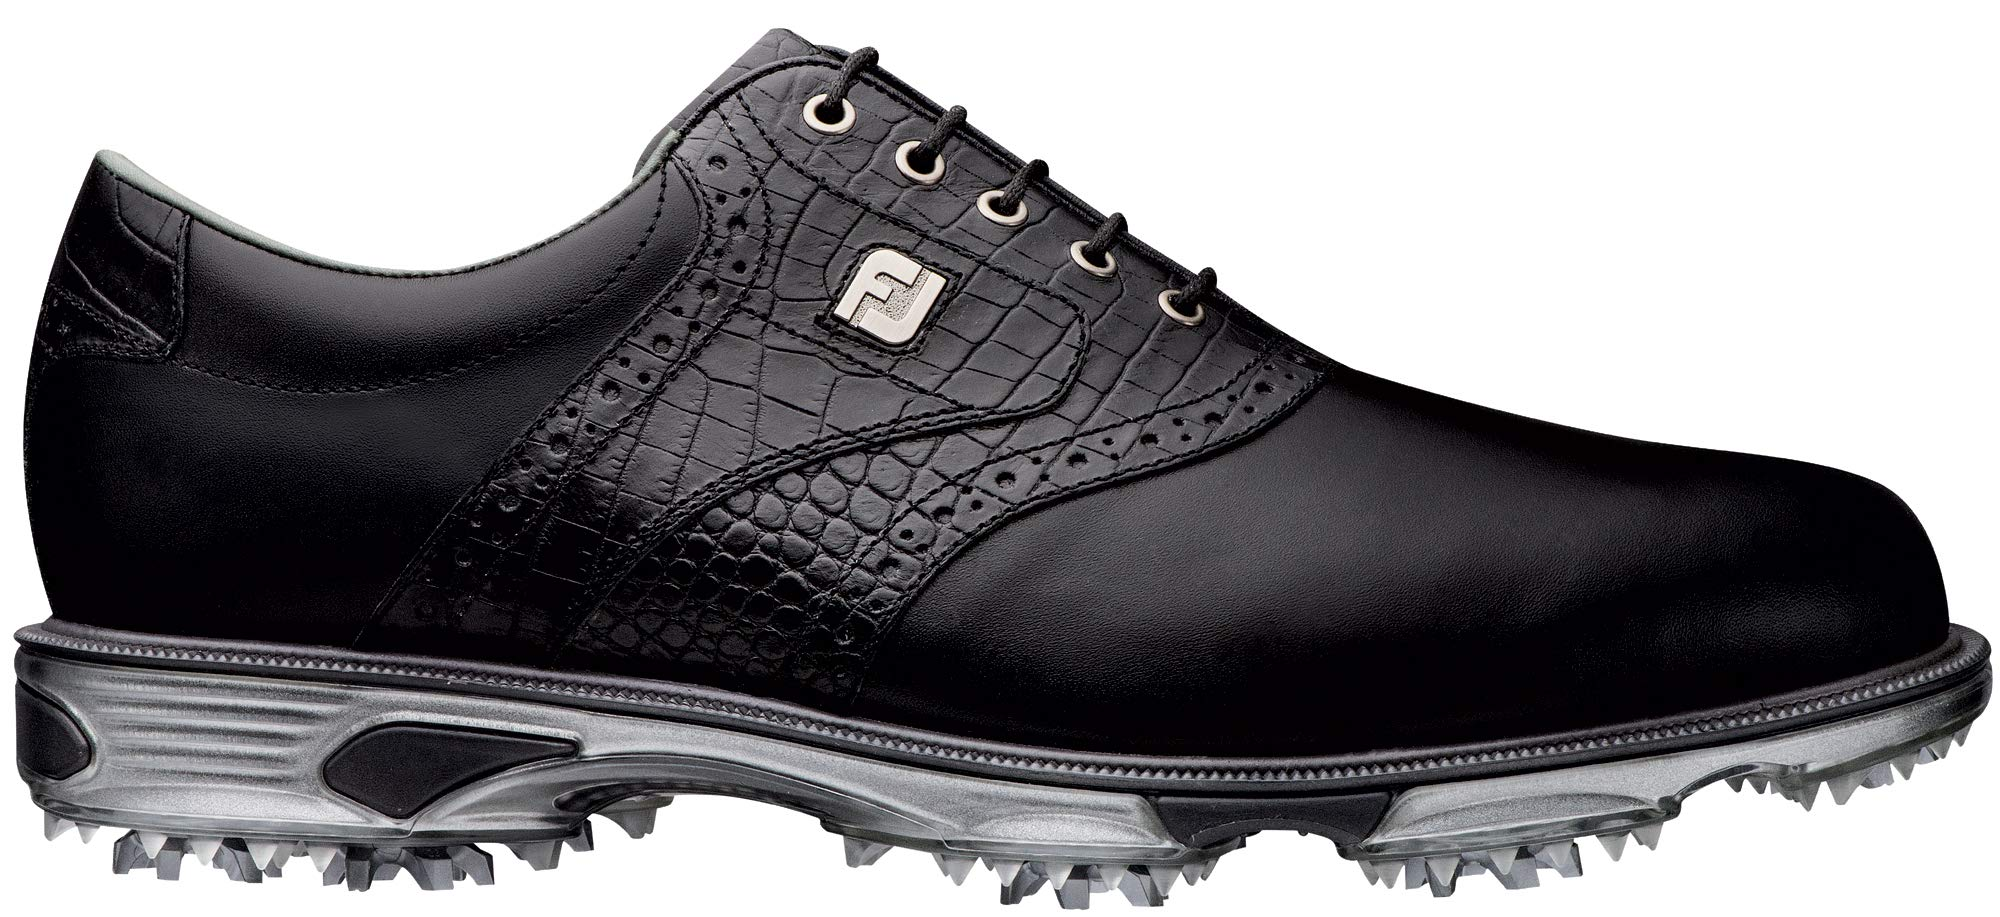 FootJoy Men's DryJoys Tour Golf Shoes Black 9.5 XW Croc, US by FootJoy